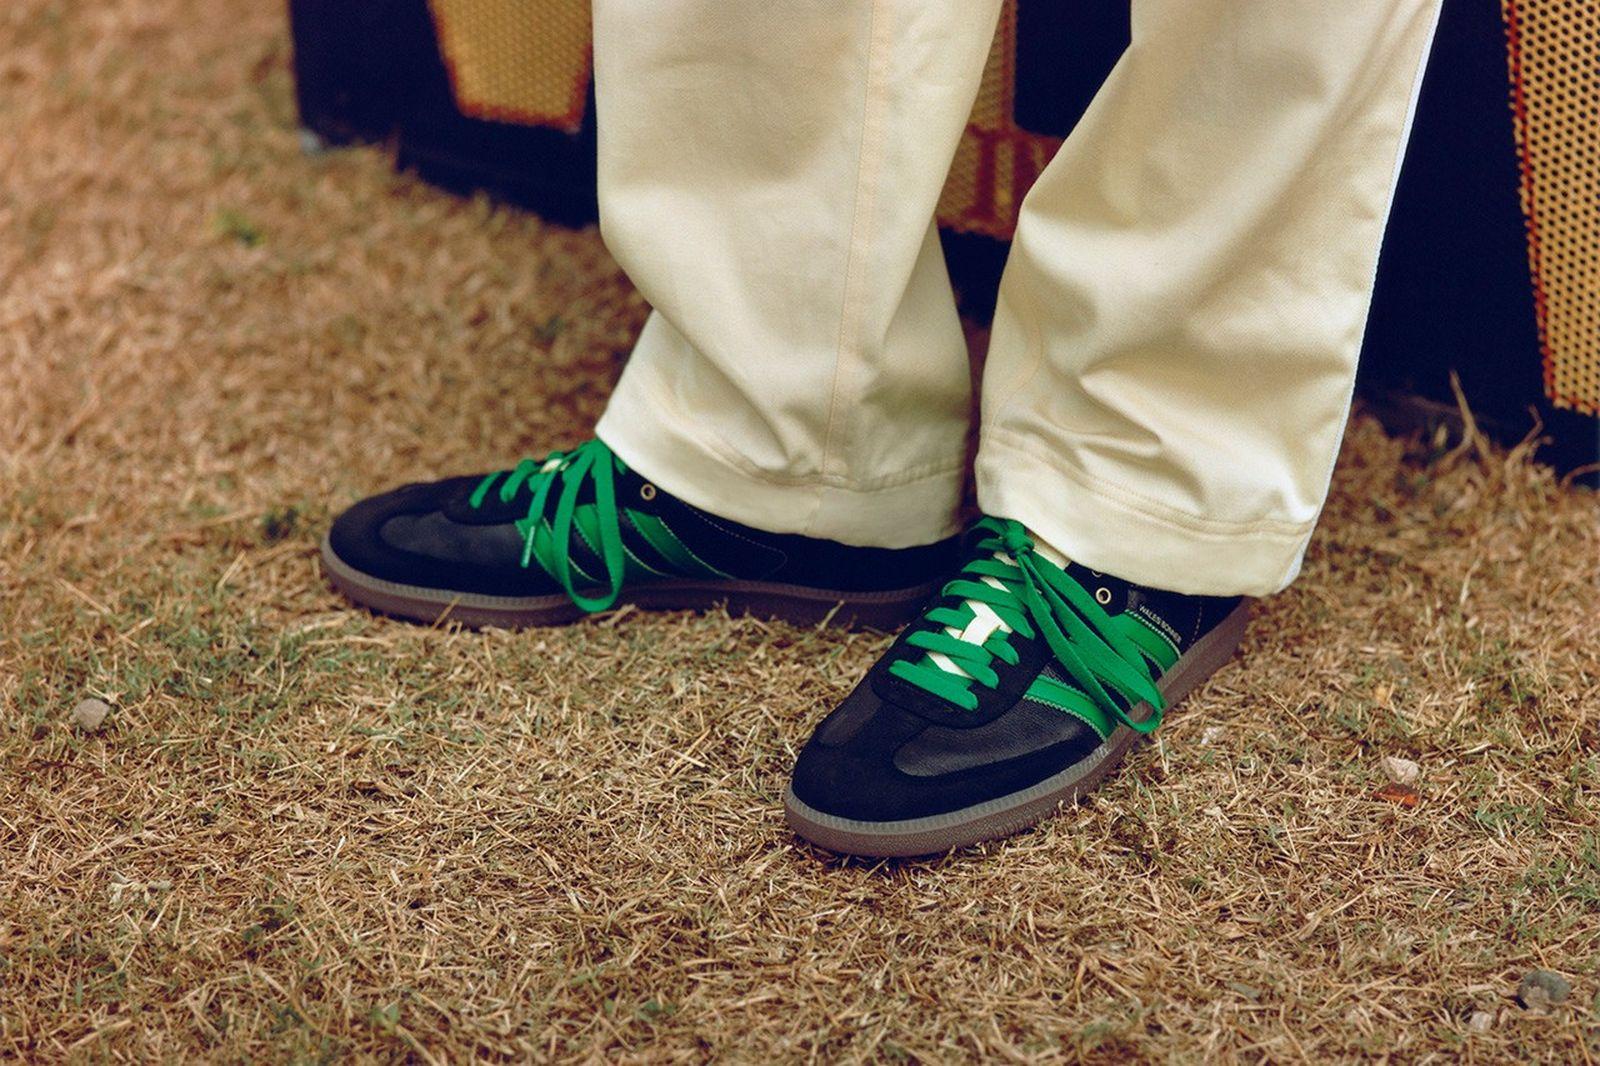 grace-wales-bonner-x-adidas-5